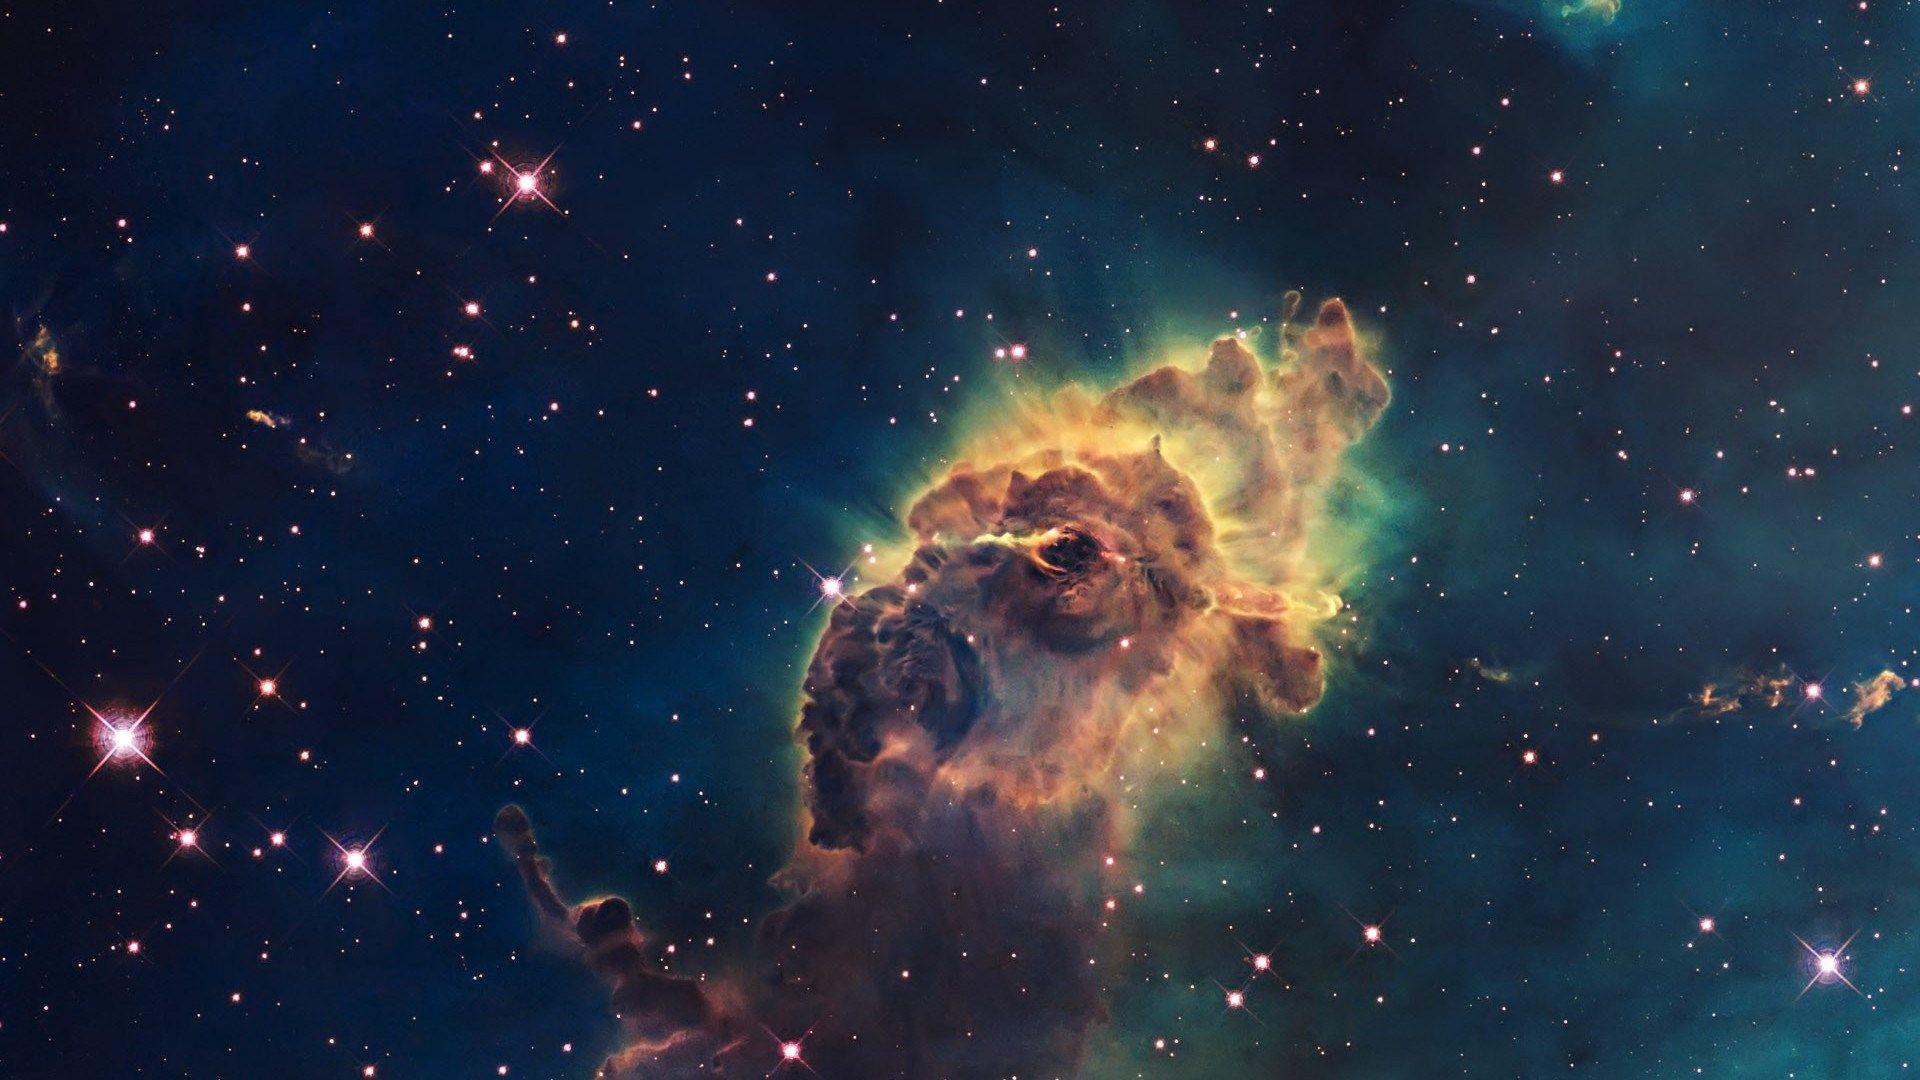 Cool Hd Space Galaxy Wallpapers: Cool Free Hd Nebula Wallpaper